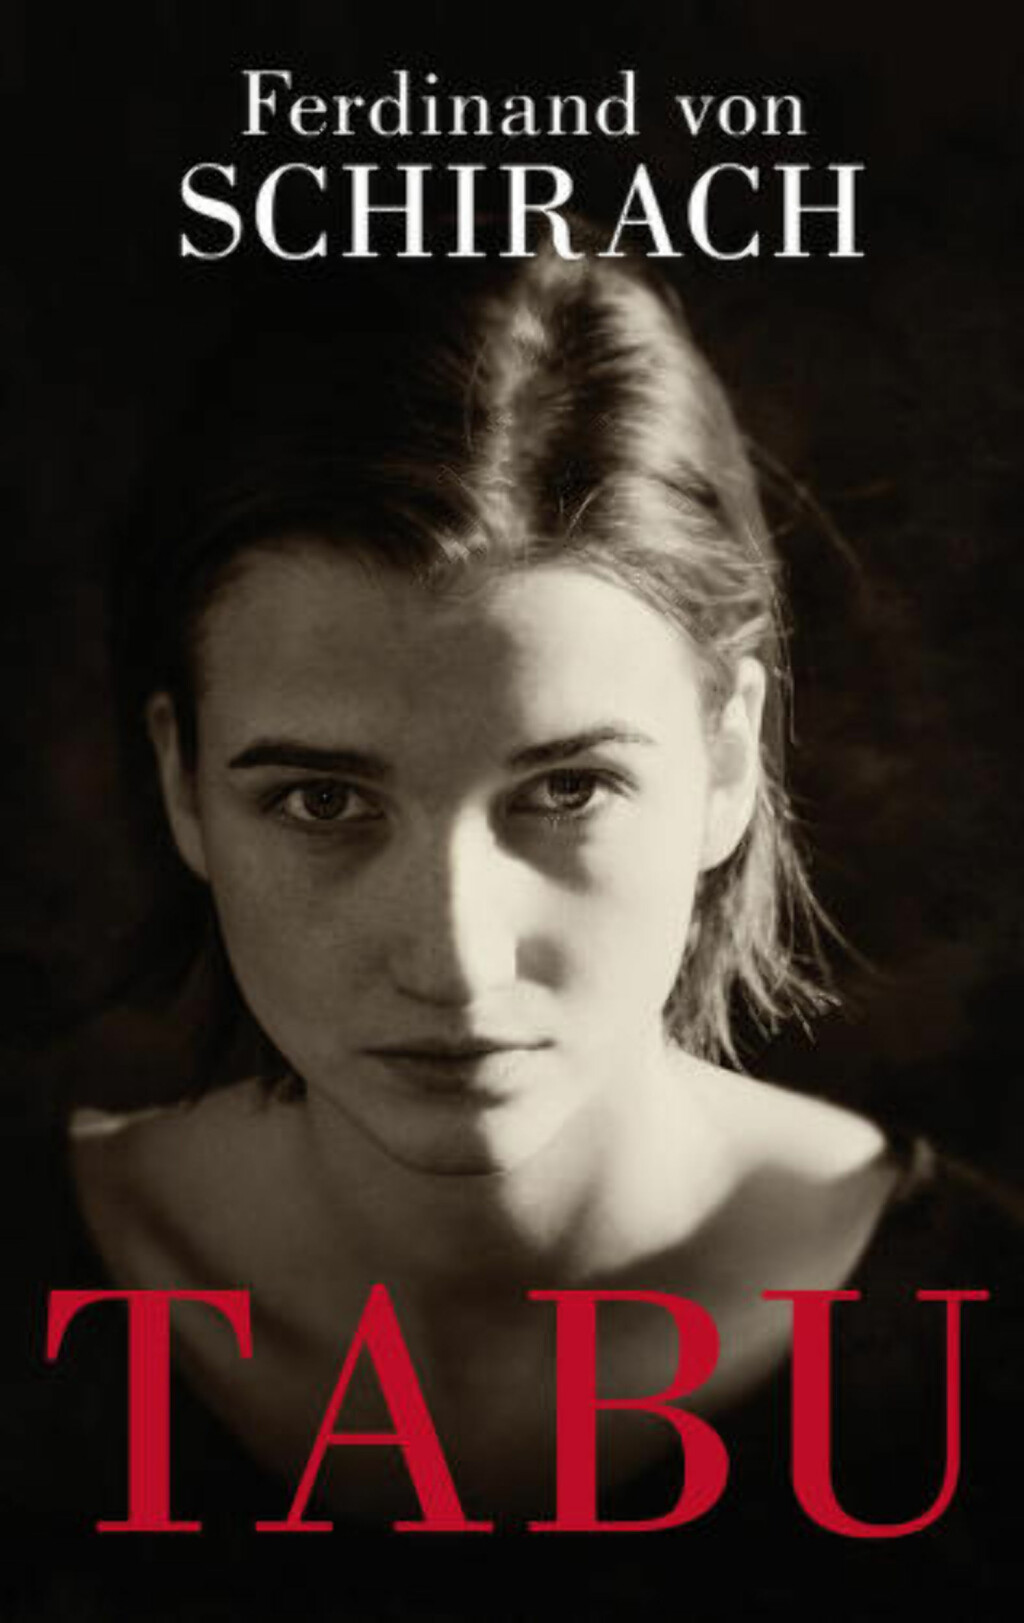 image: Hovedpersonen har en vag likhet med heltene i «Fifty shades»-litteraturen